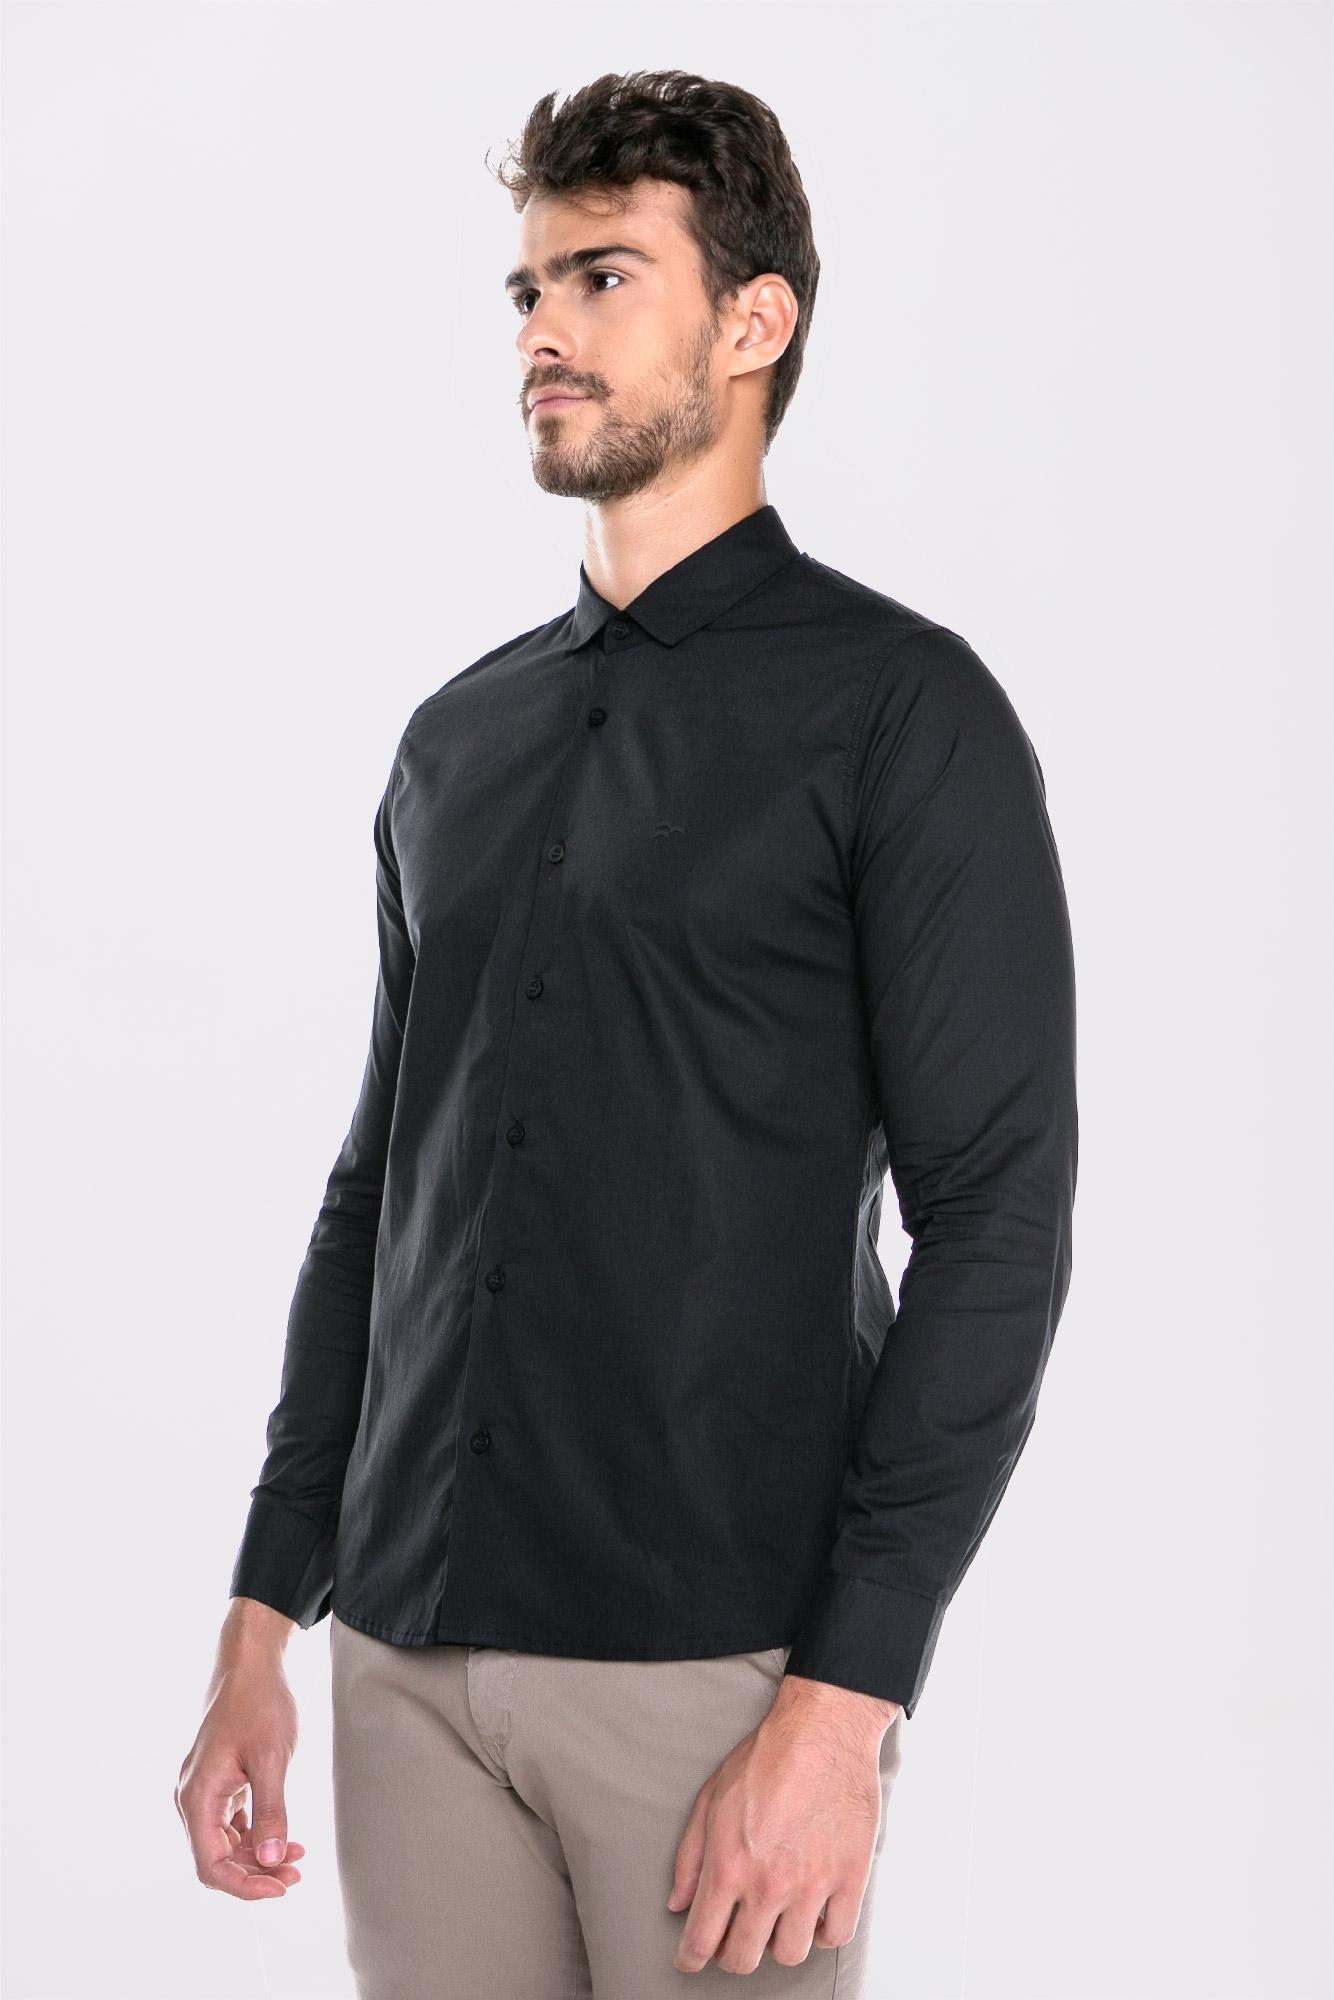 Camisa Social Ml Confort Black